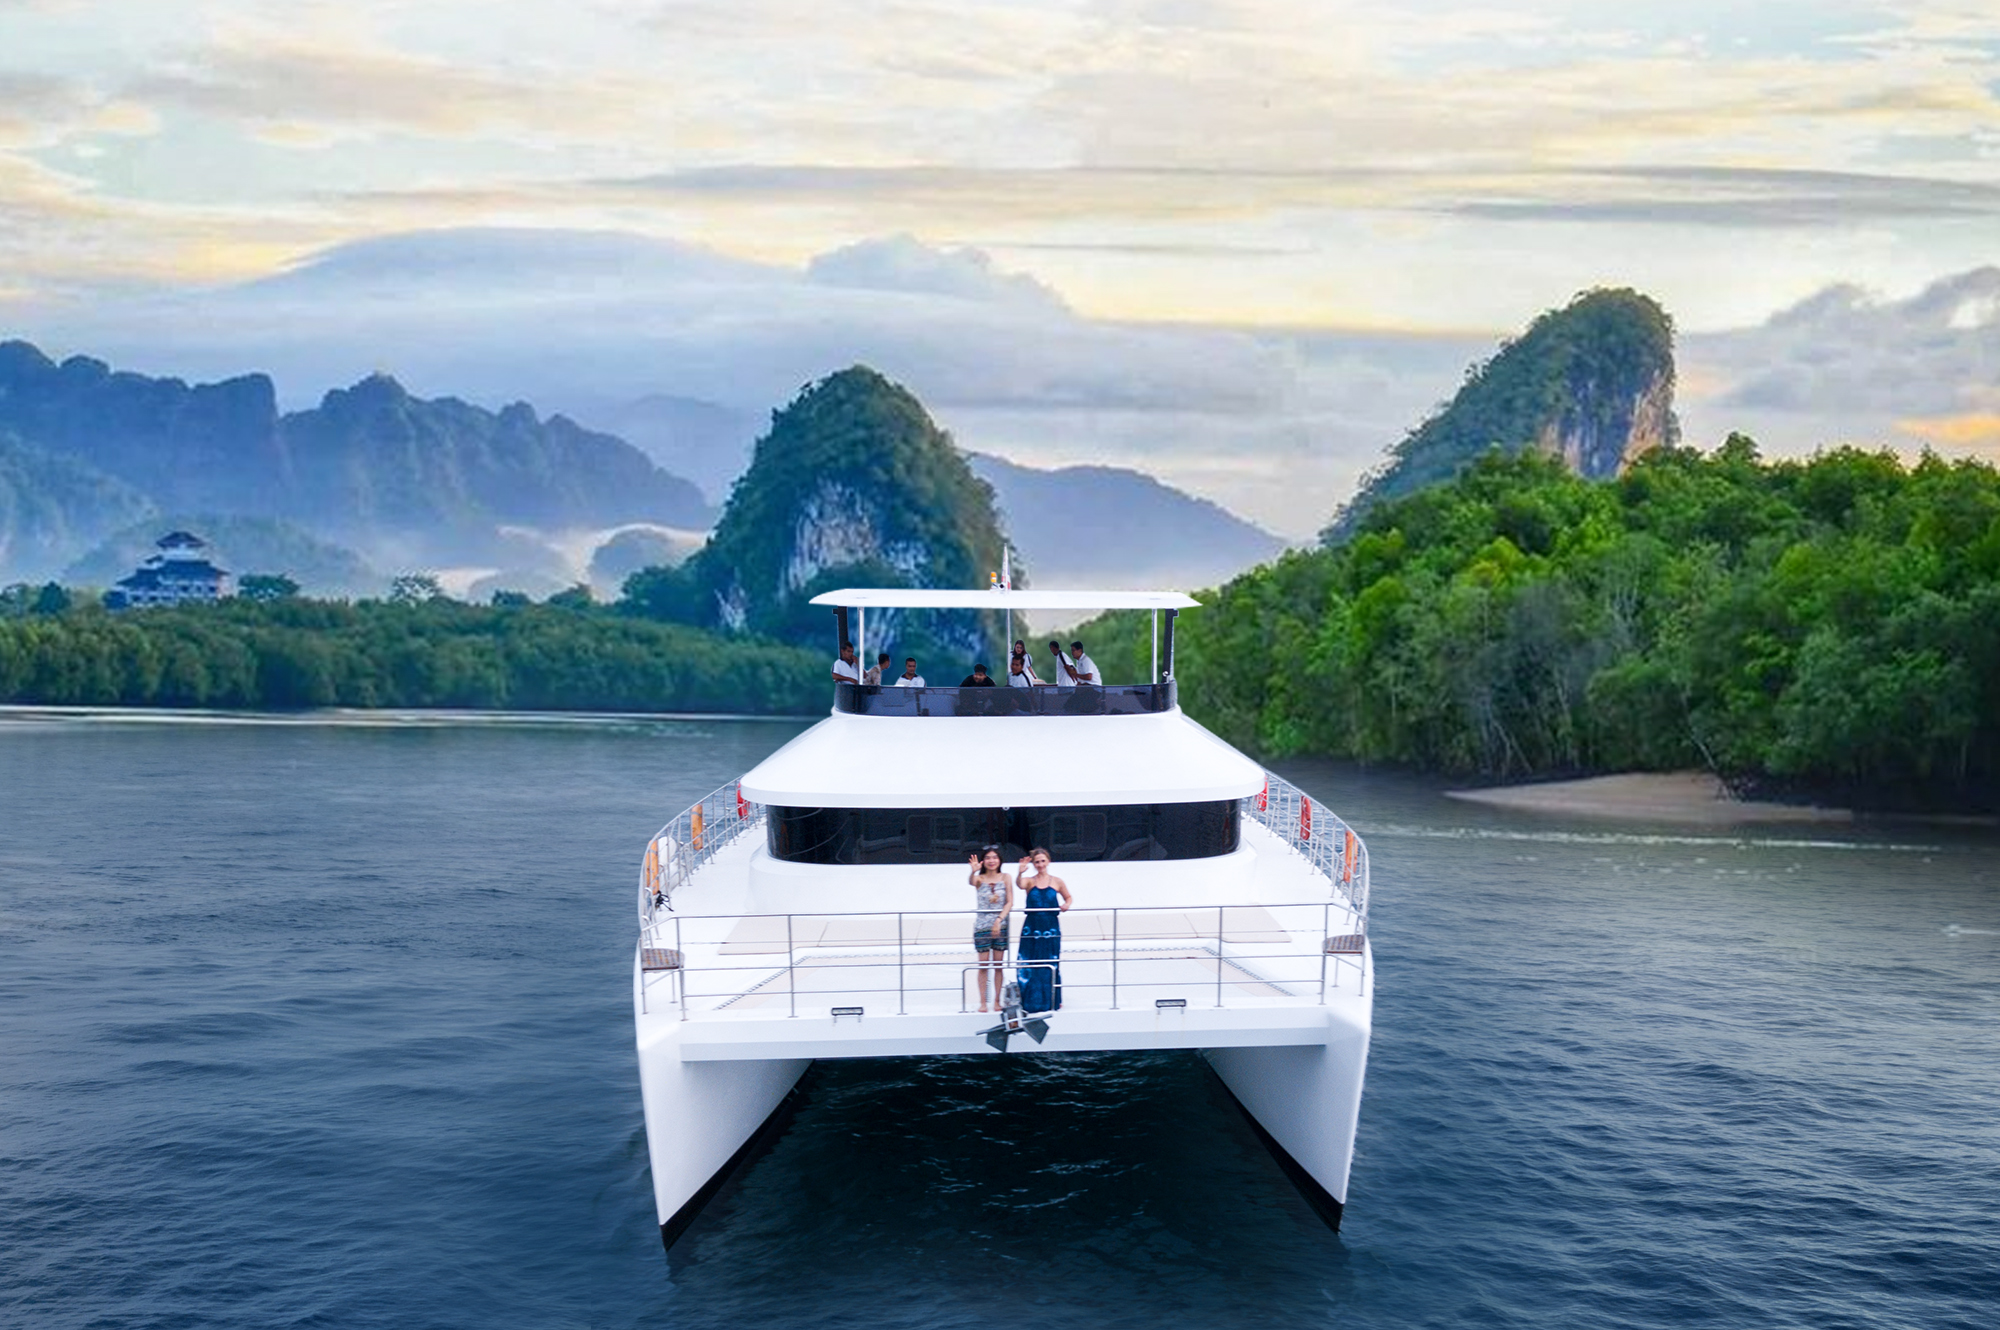 Krabi Cruise23